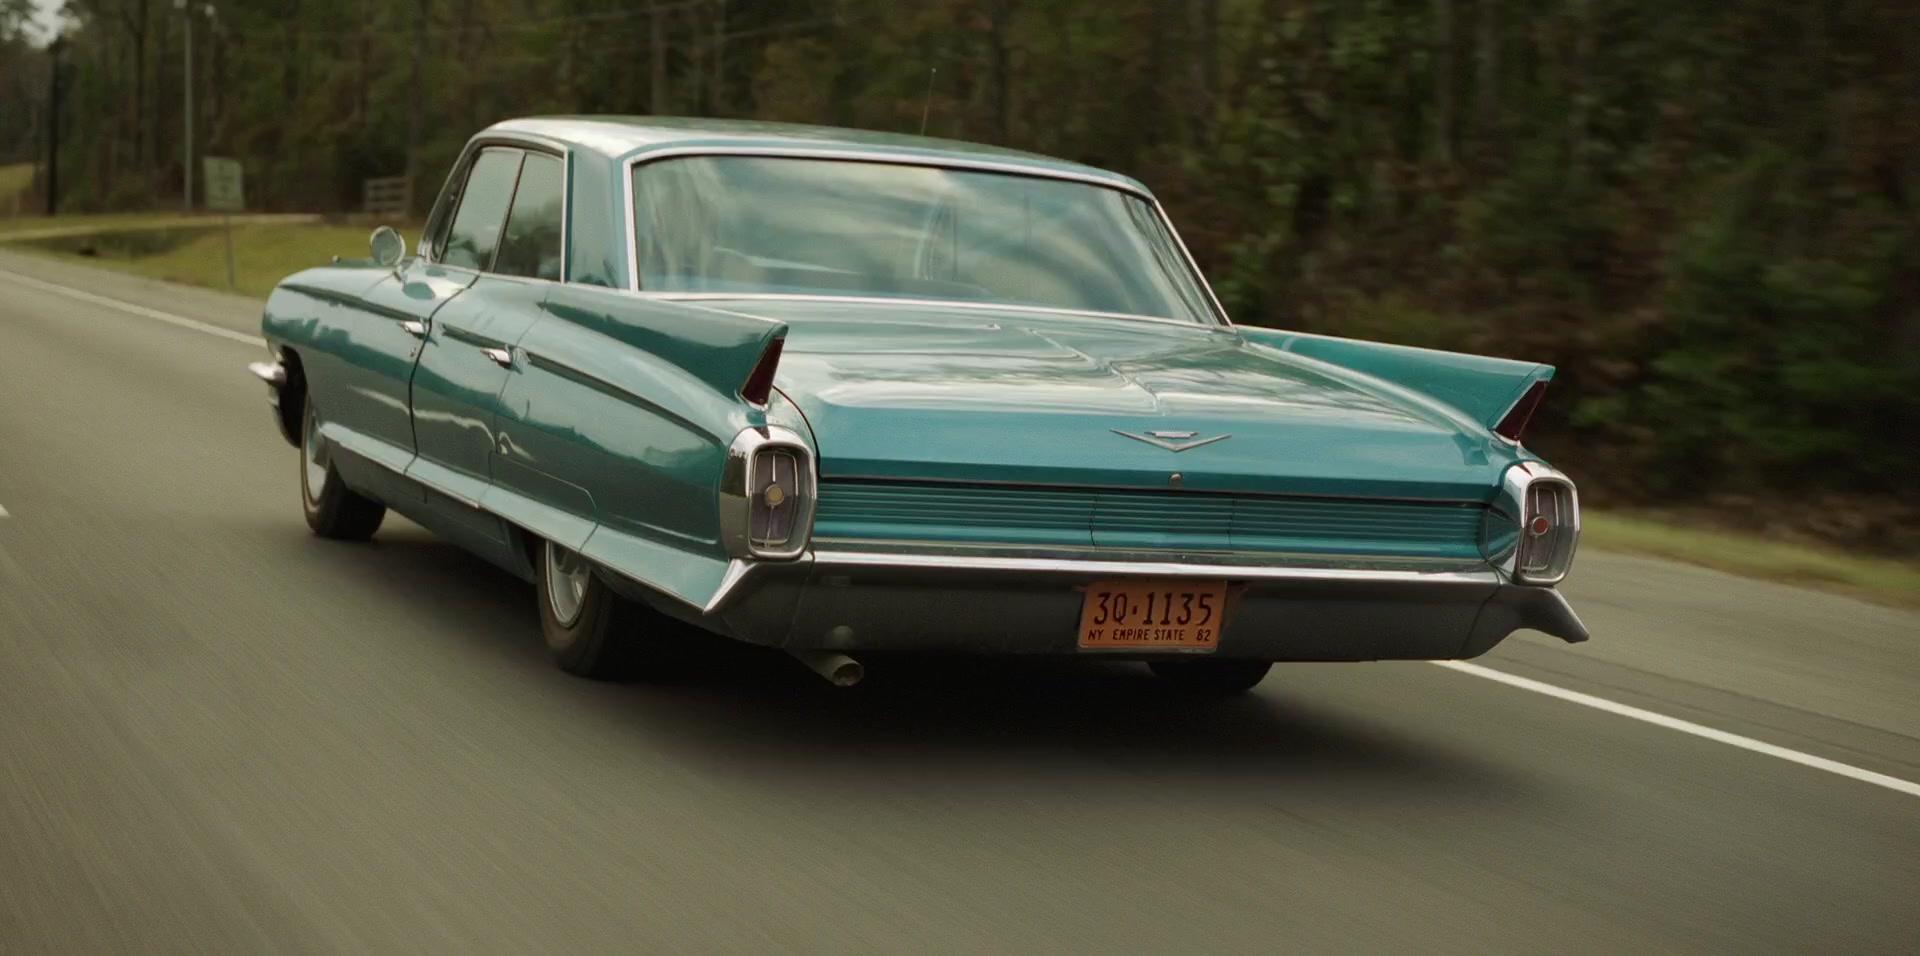 Cadillac Car In Green Book 2018 Movie